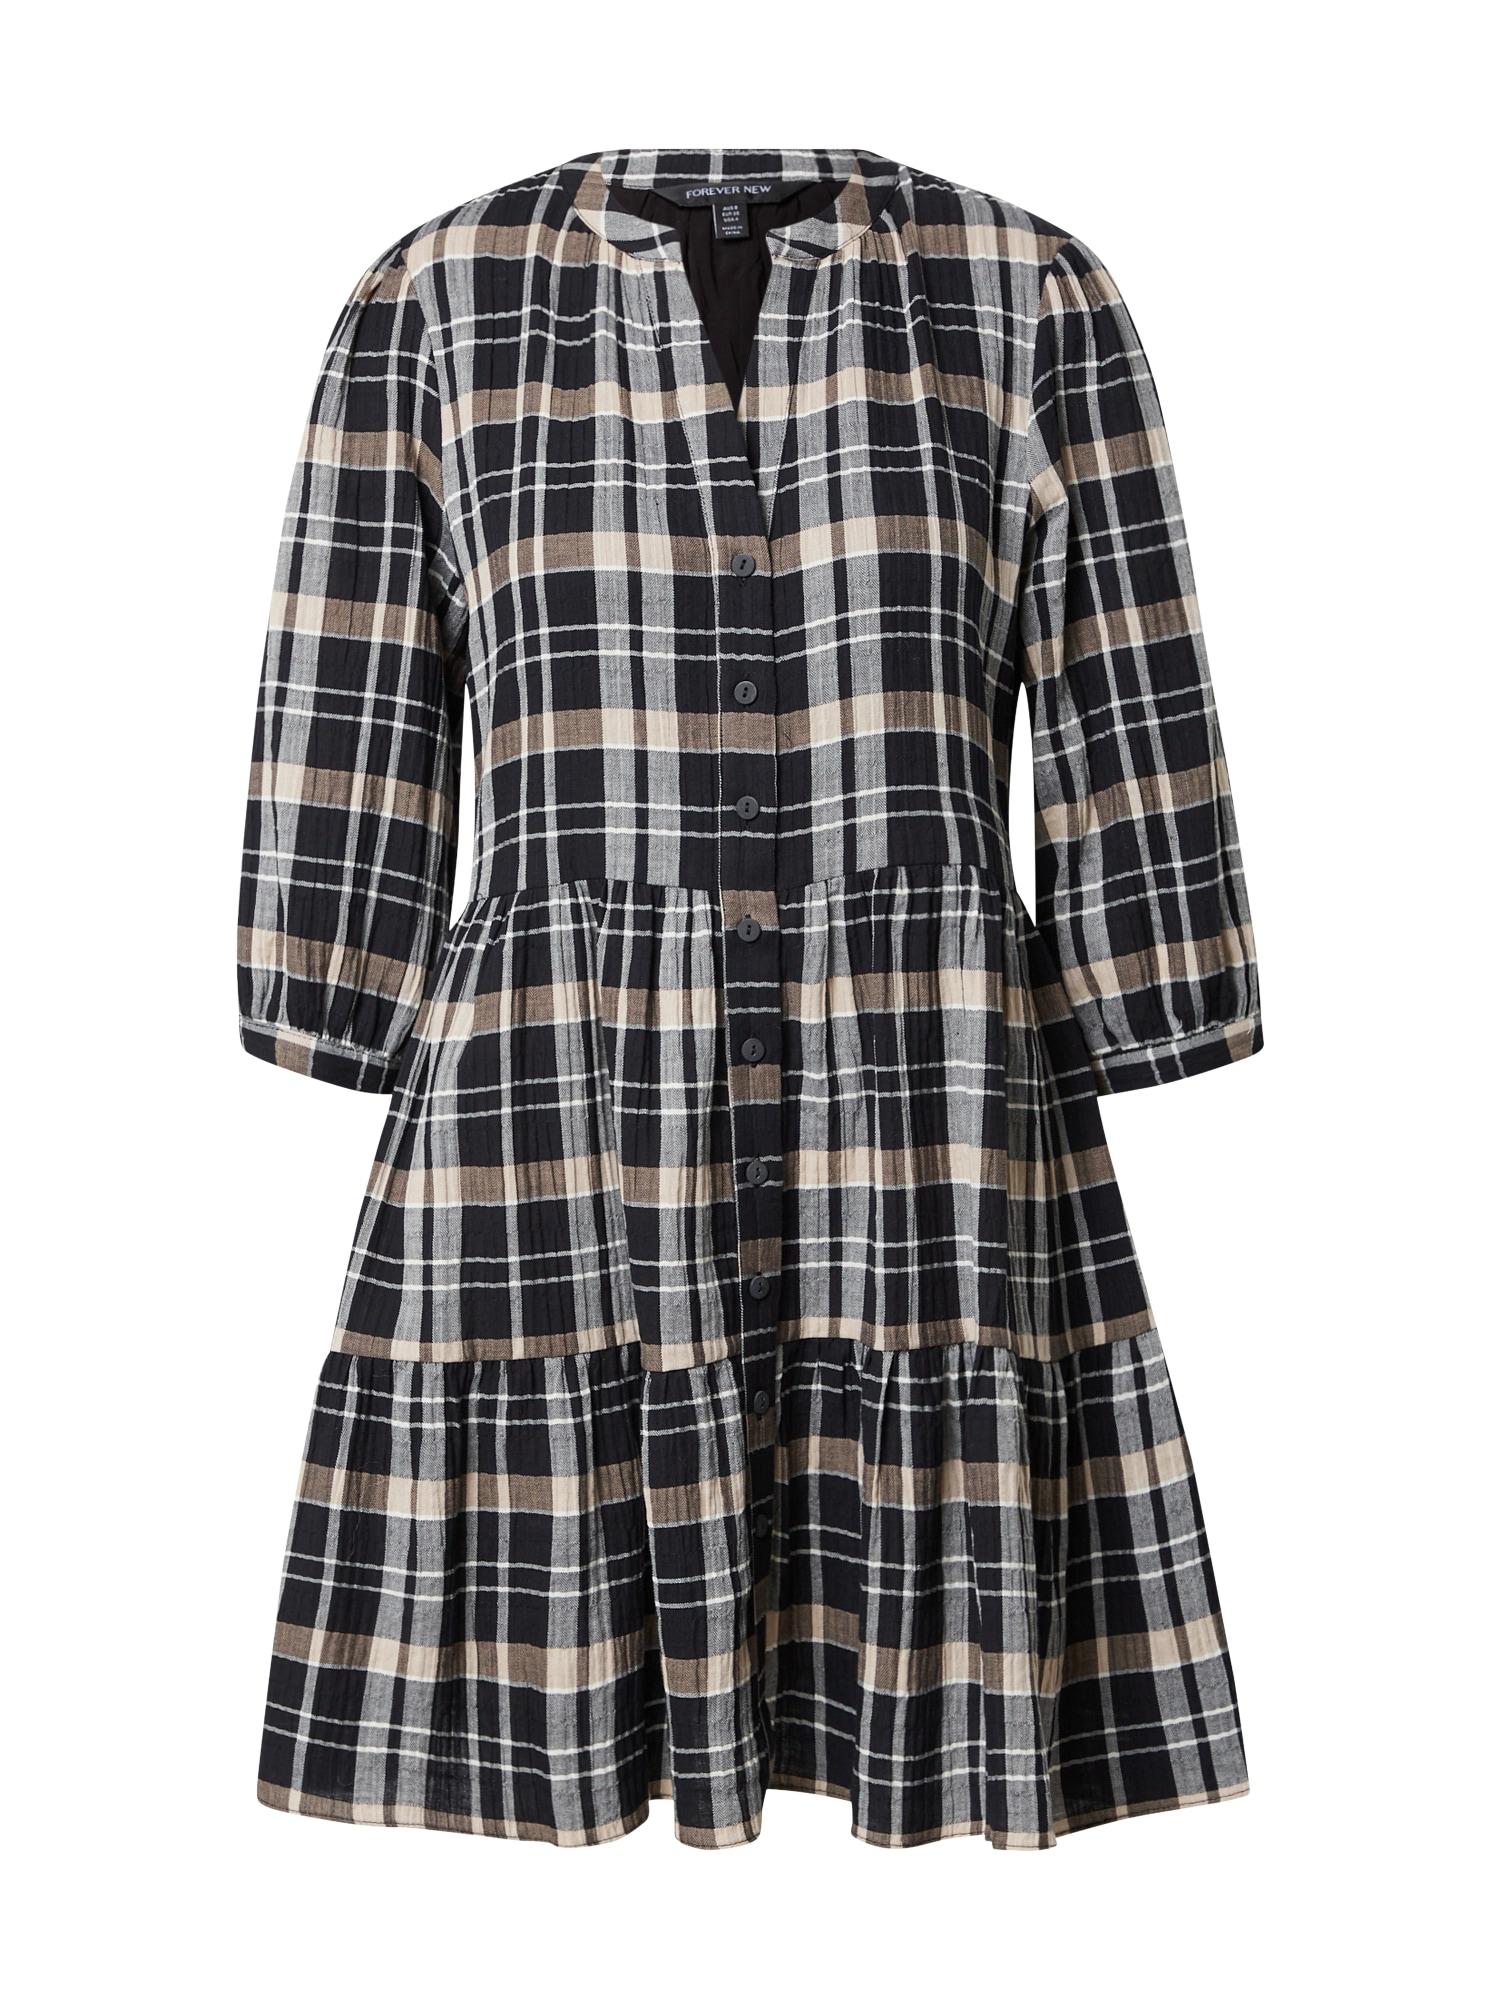 Forever New Košilové šaty 'Gina'  černá / béžová / šedobéžová / bílá